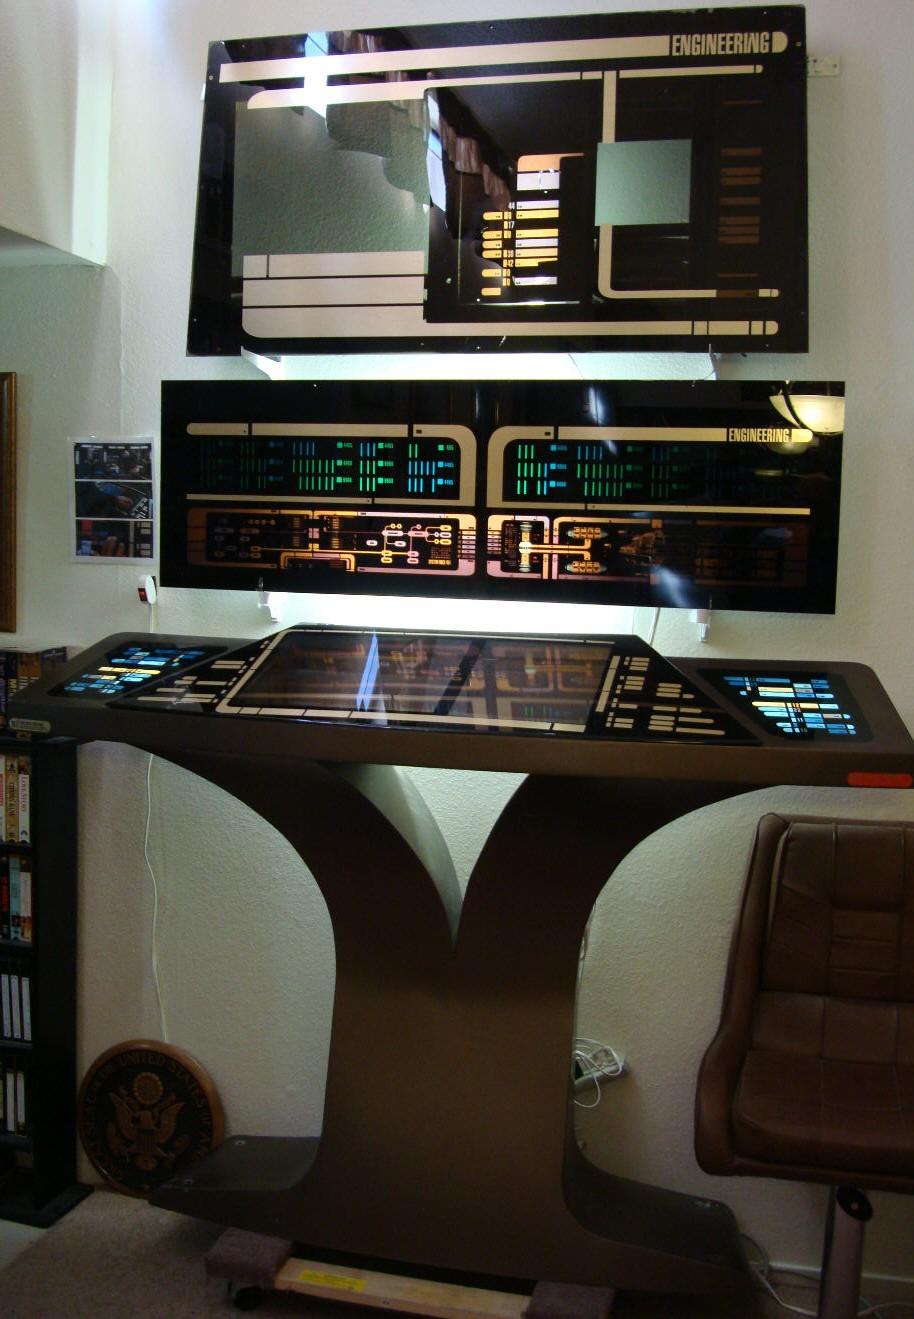 Star trek prop costume auction authority star trek viii x u s s enterprise e bridge - Star trek online console ...